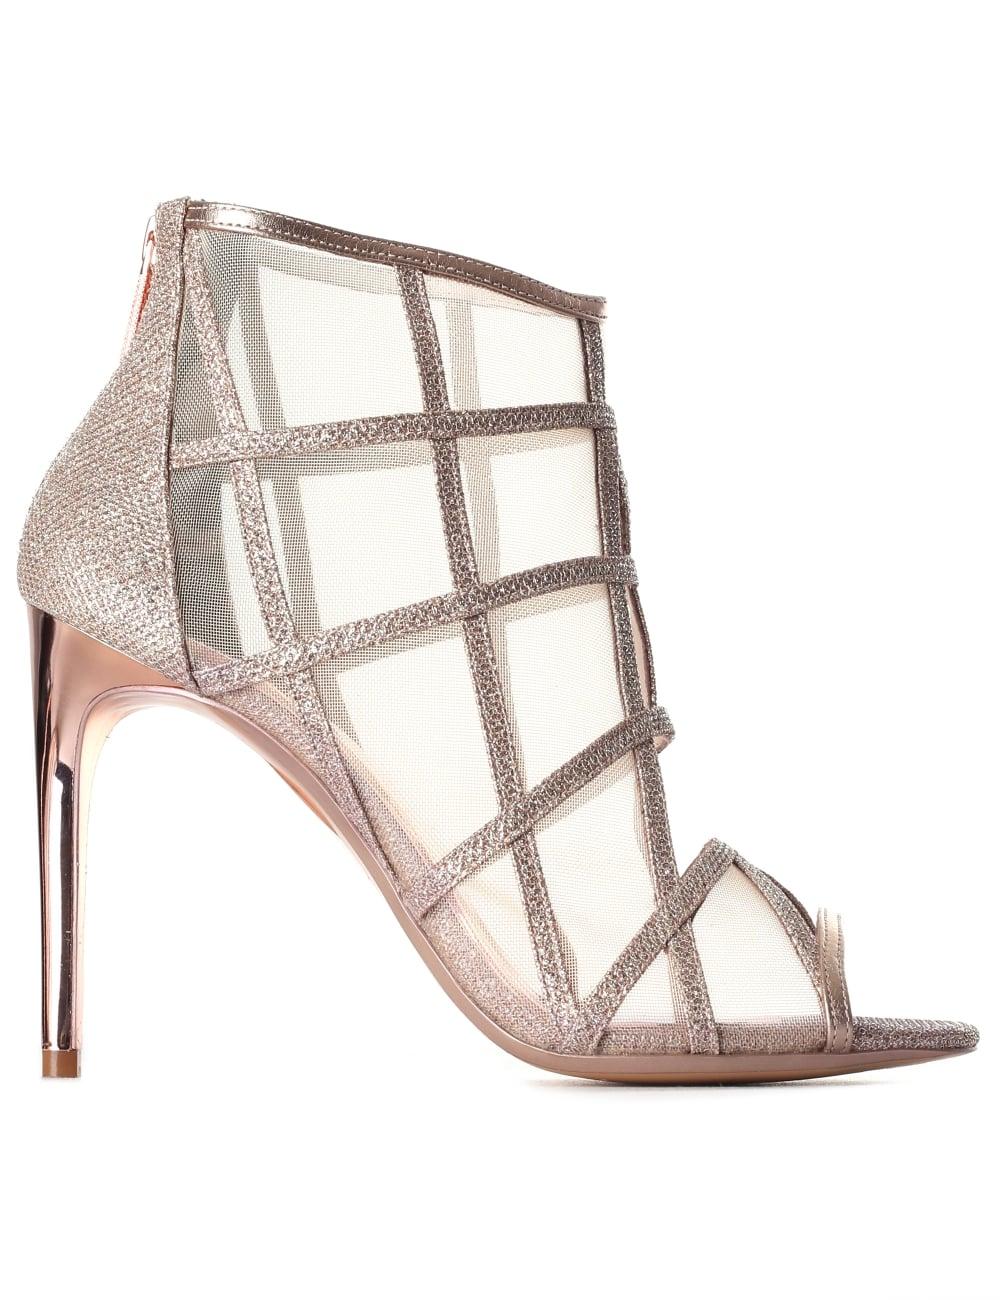 de9285bcc669 Ted Baker Women s Xstal Mesh Peep Toe Boots Rose Gold